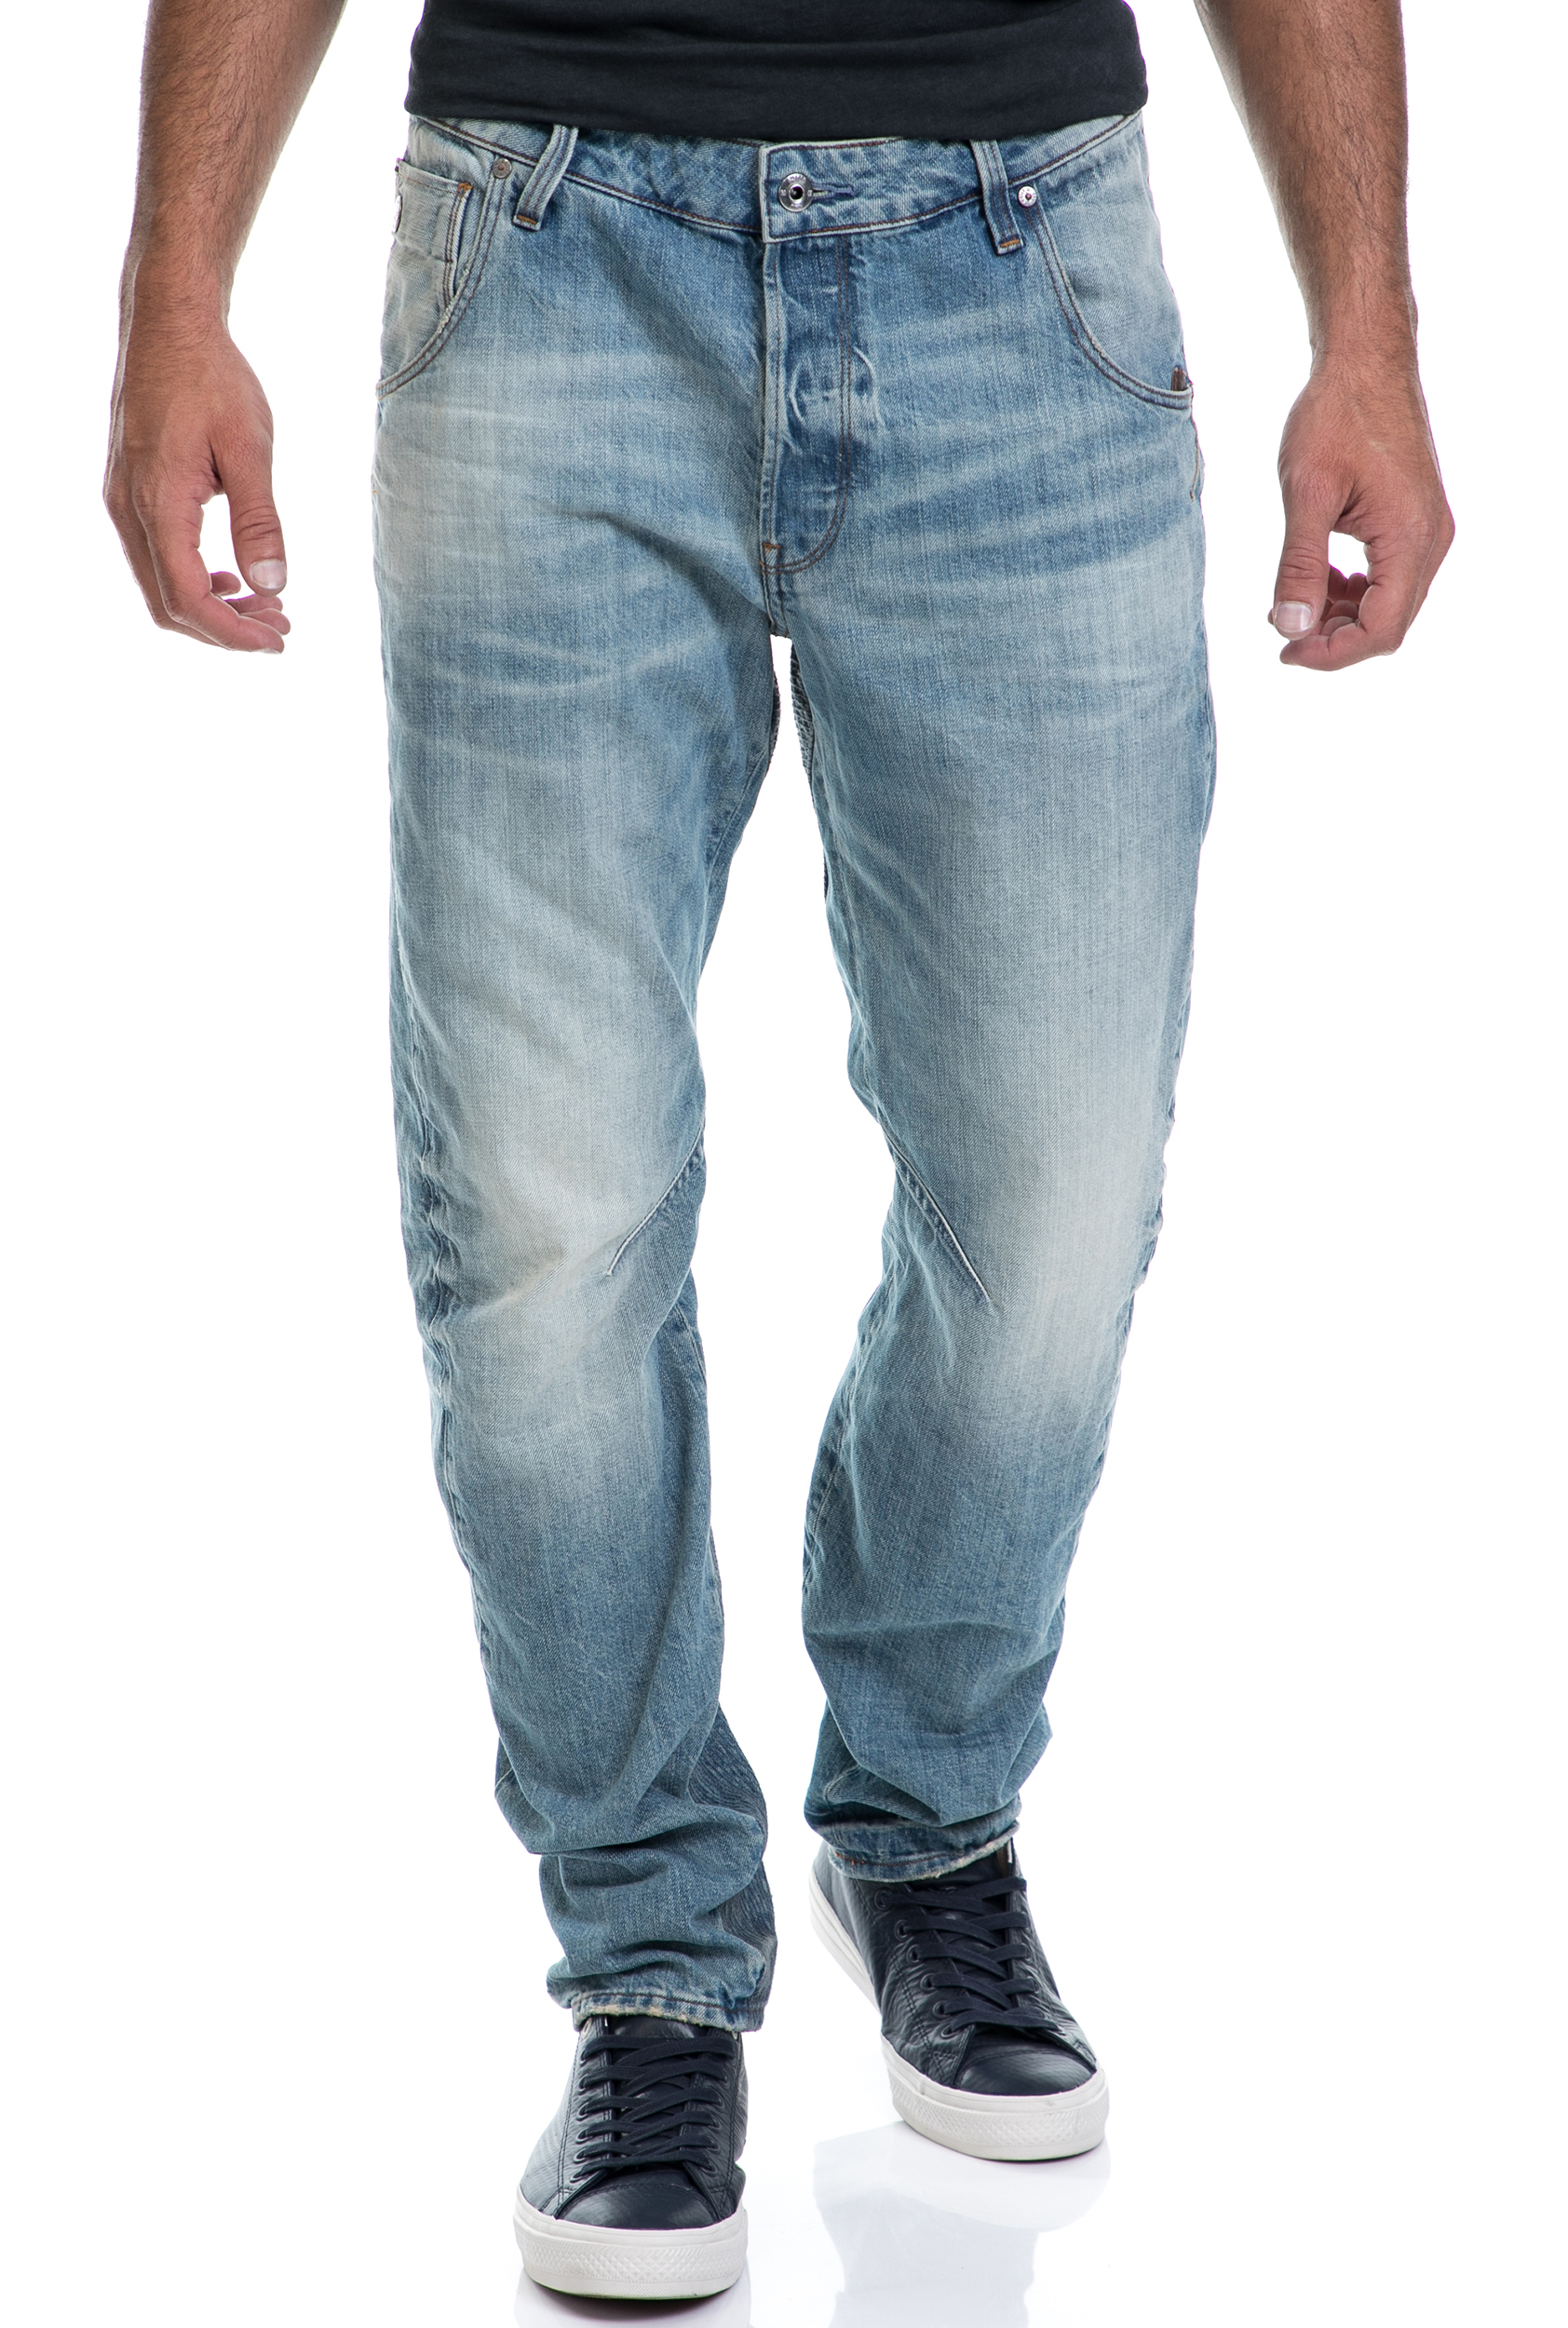 bd75b7aa4ade G-STAR RAW - Ανδρικό παντελόνι Arc 3D Tapered Prestored G-STAR RAW μπλε